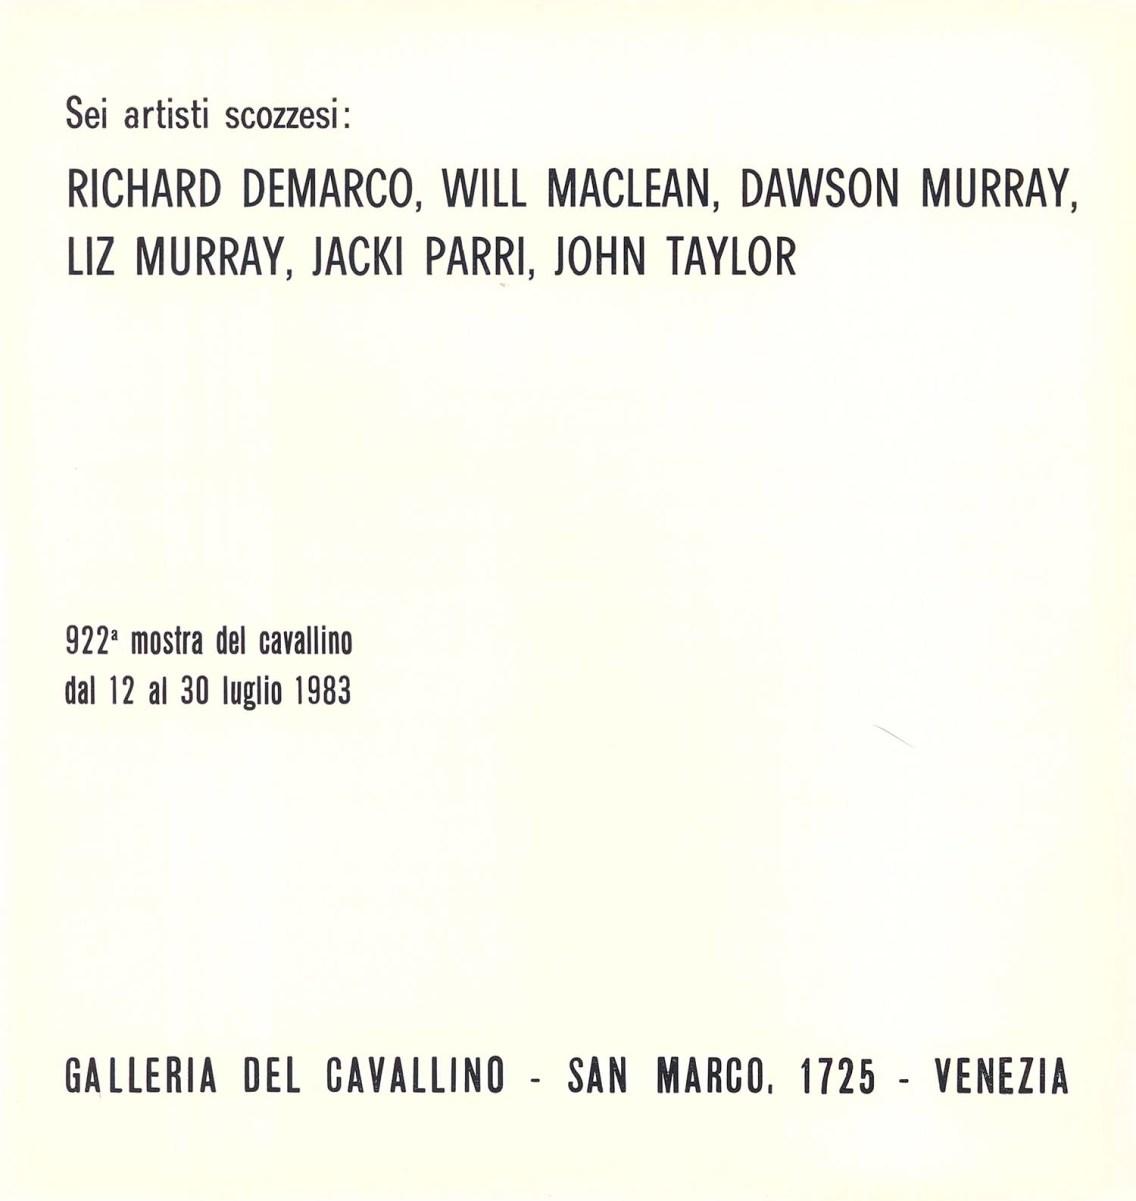 12 - 30 July 1983. Exhibition catalogue (cover). Sei Artisti Scozzesi (Six Scottish Artists): Richard Demarco, Will Maclean, Dawson Murray, Liz Murray, Jacki Parry, John Taylor, exhibition at Galleria del Cavallino, Venice, Italy